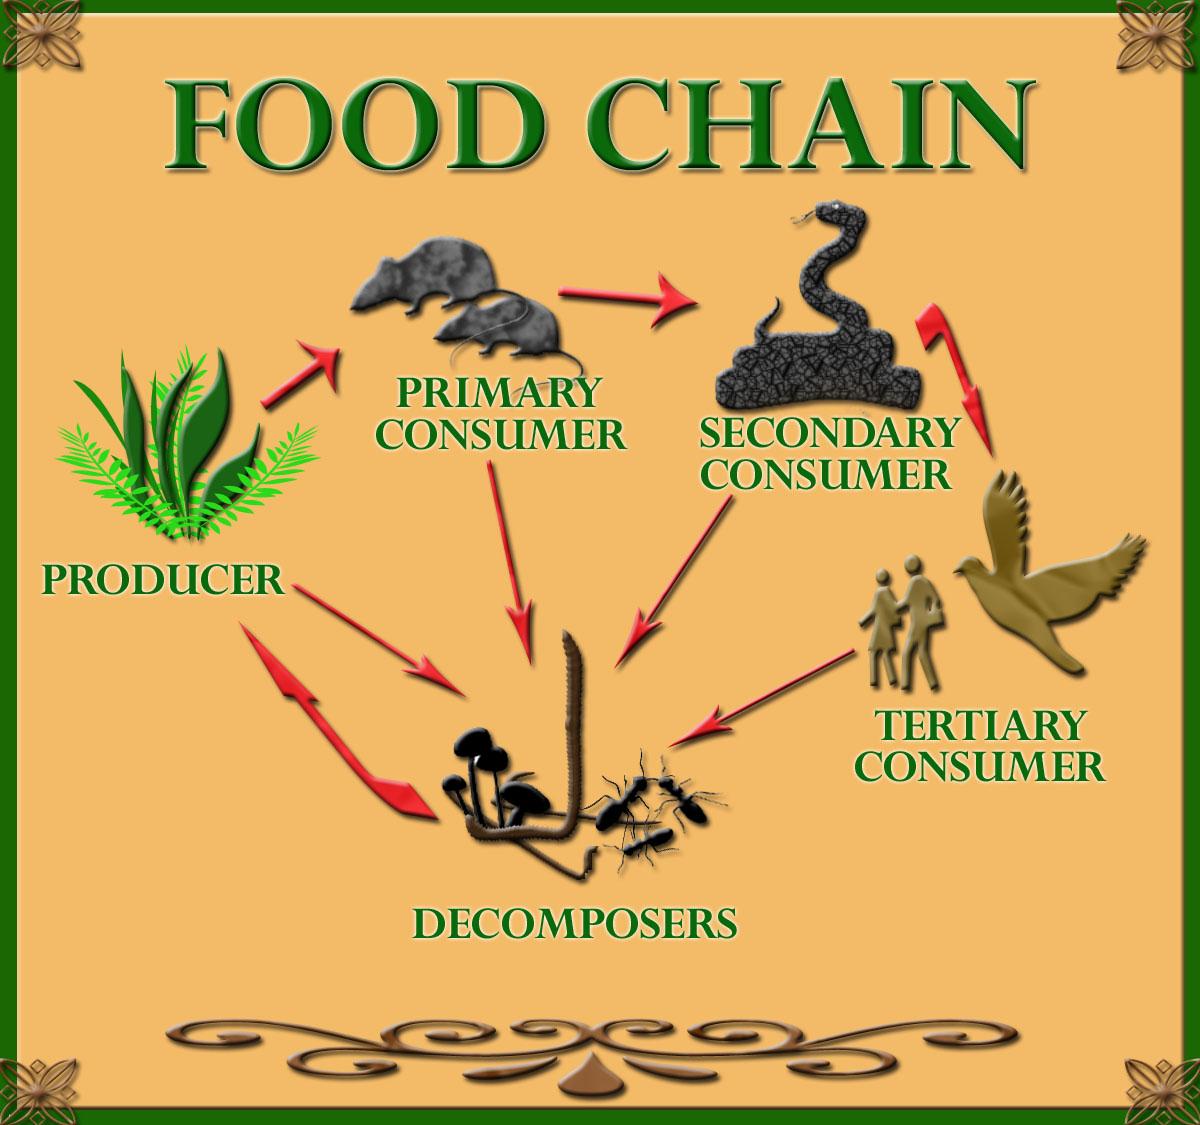 ... chain; Prim... Quaternary Consumer